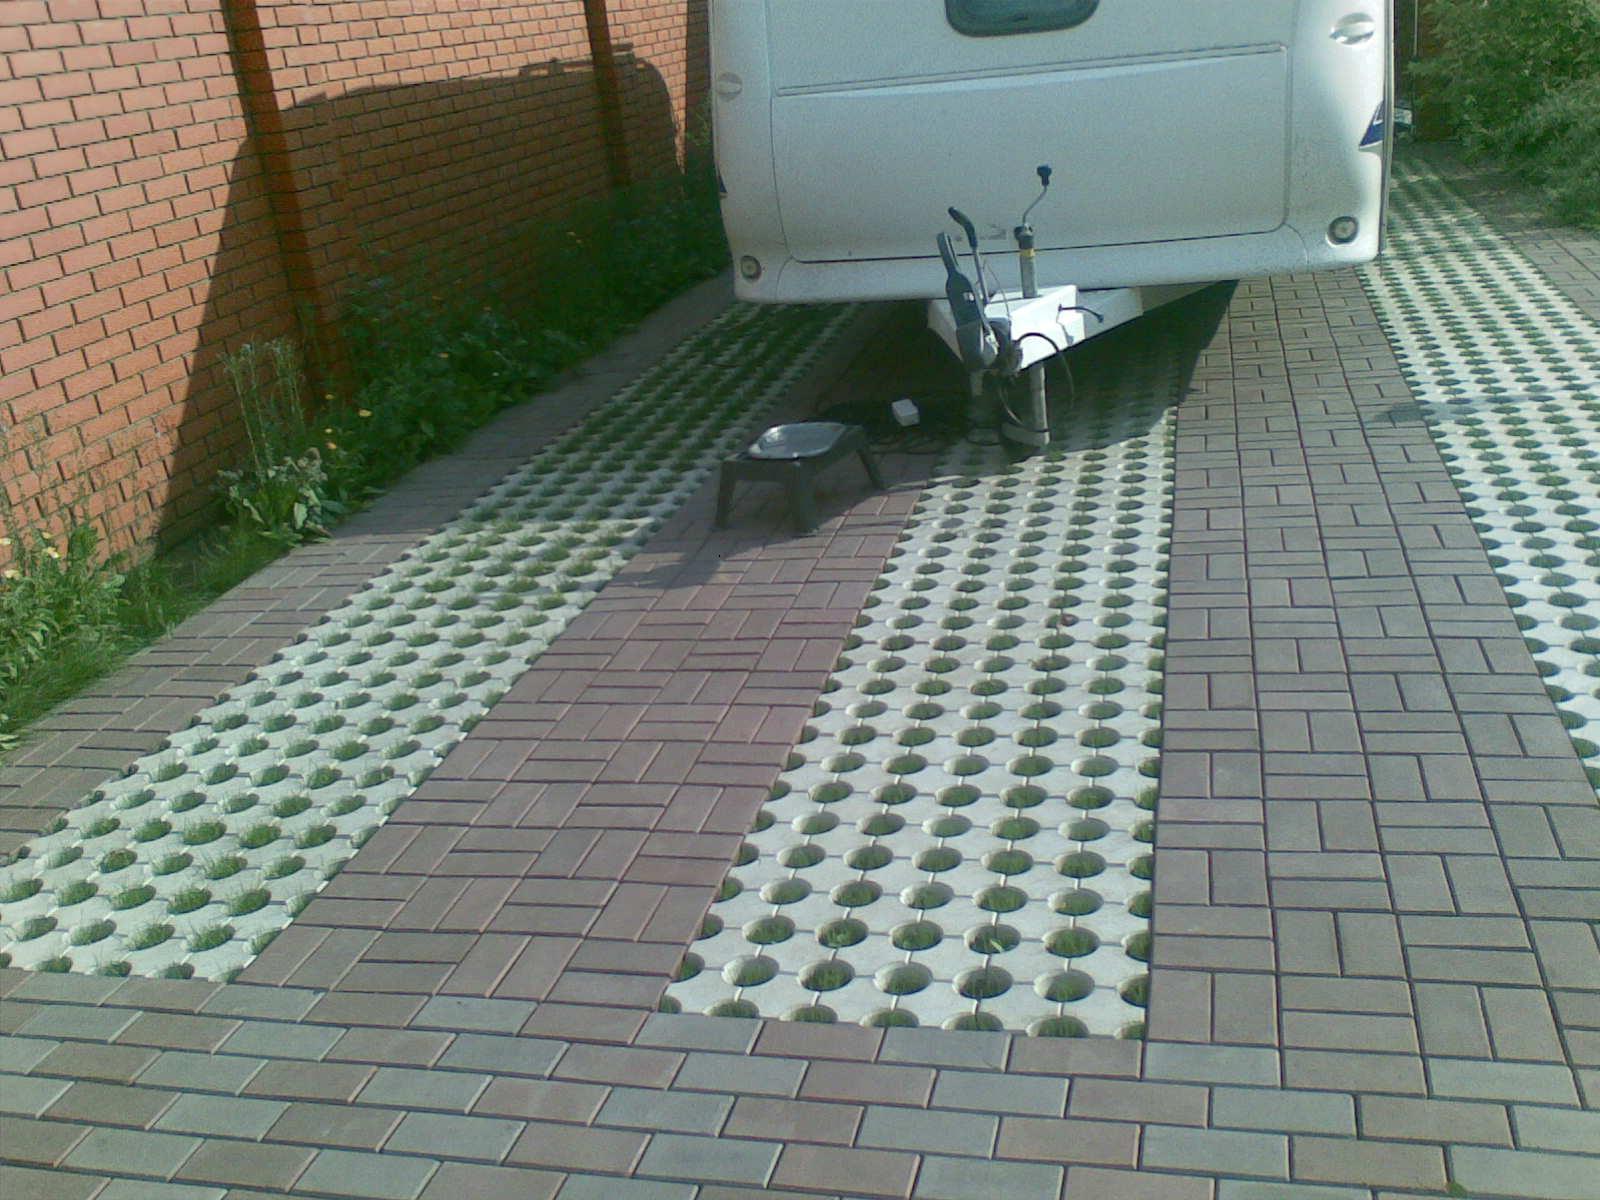 Укладка плитки под автостоянку